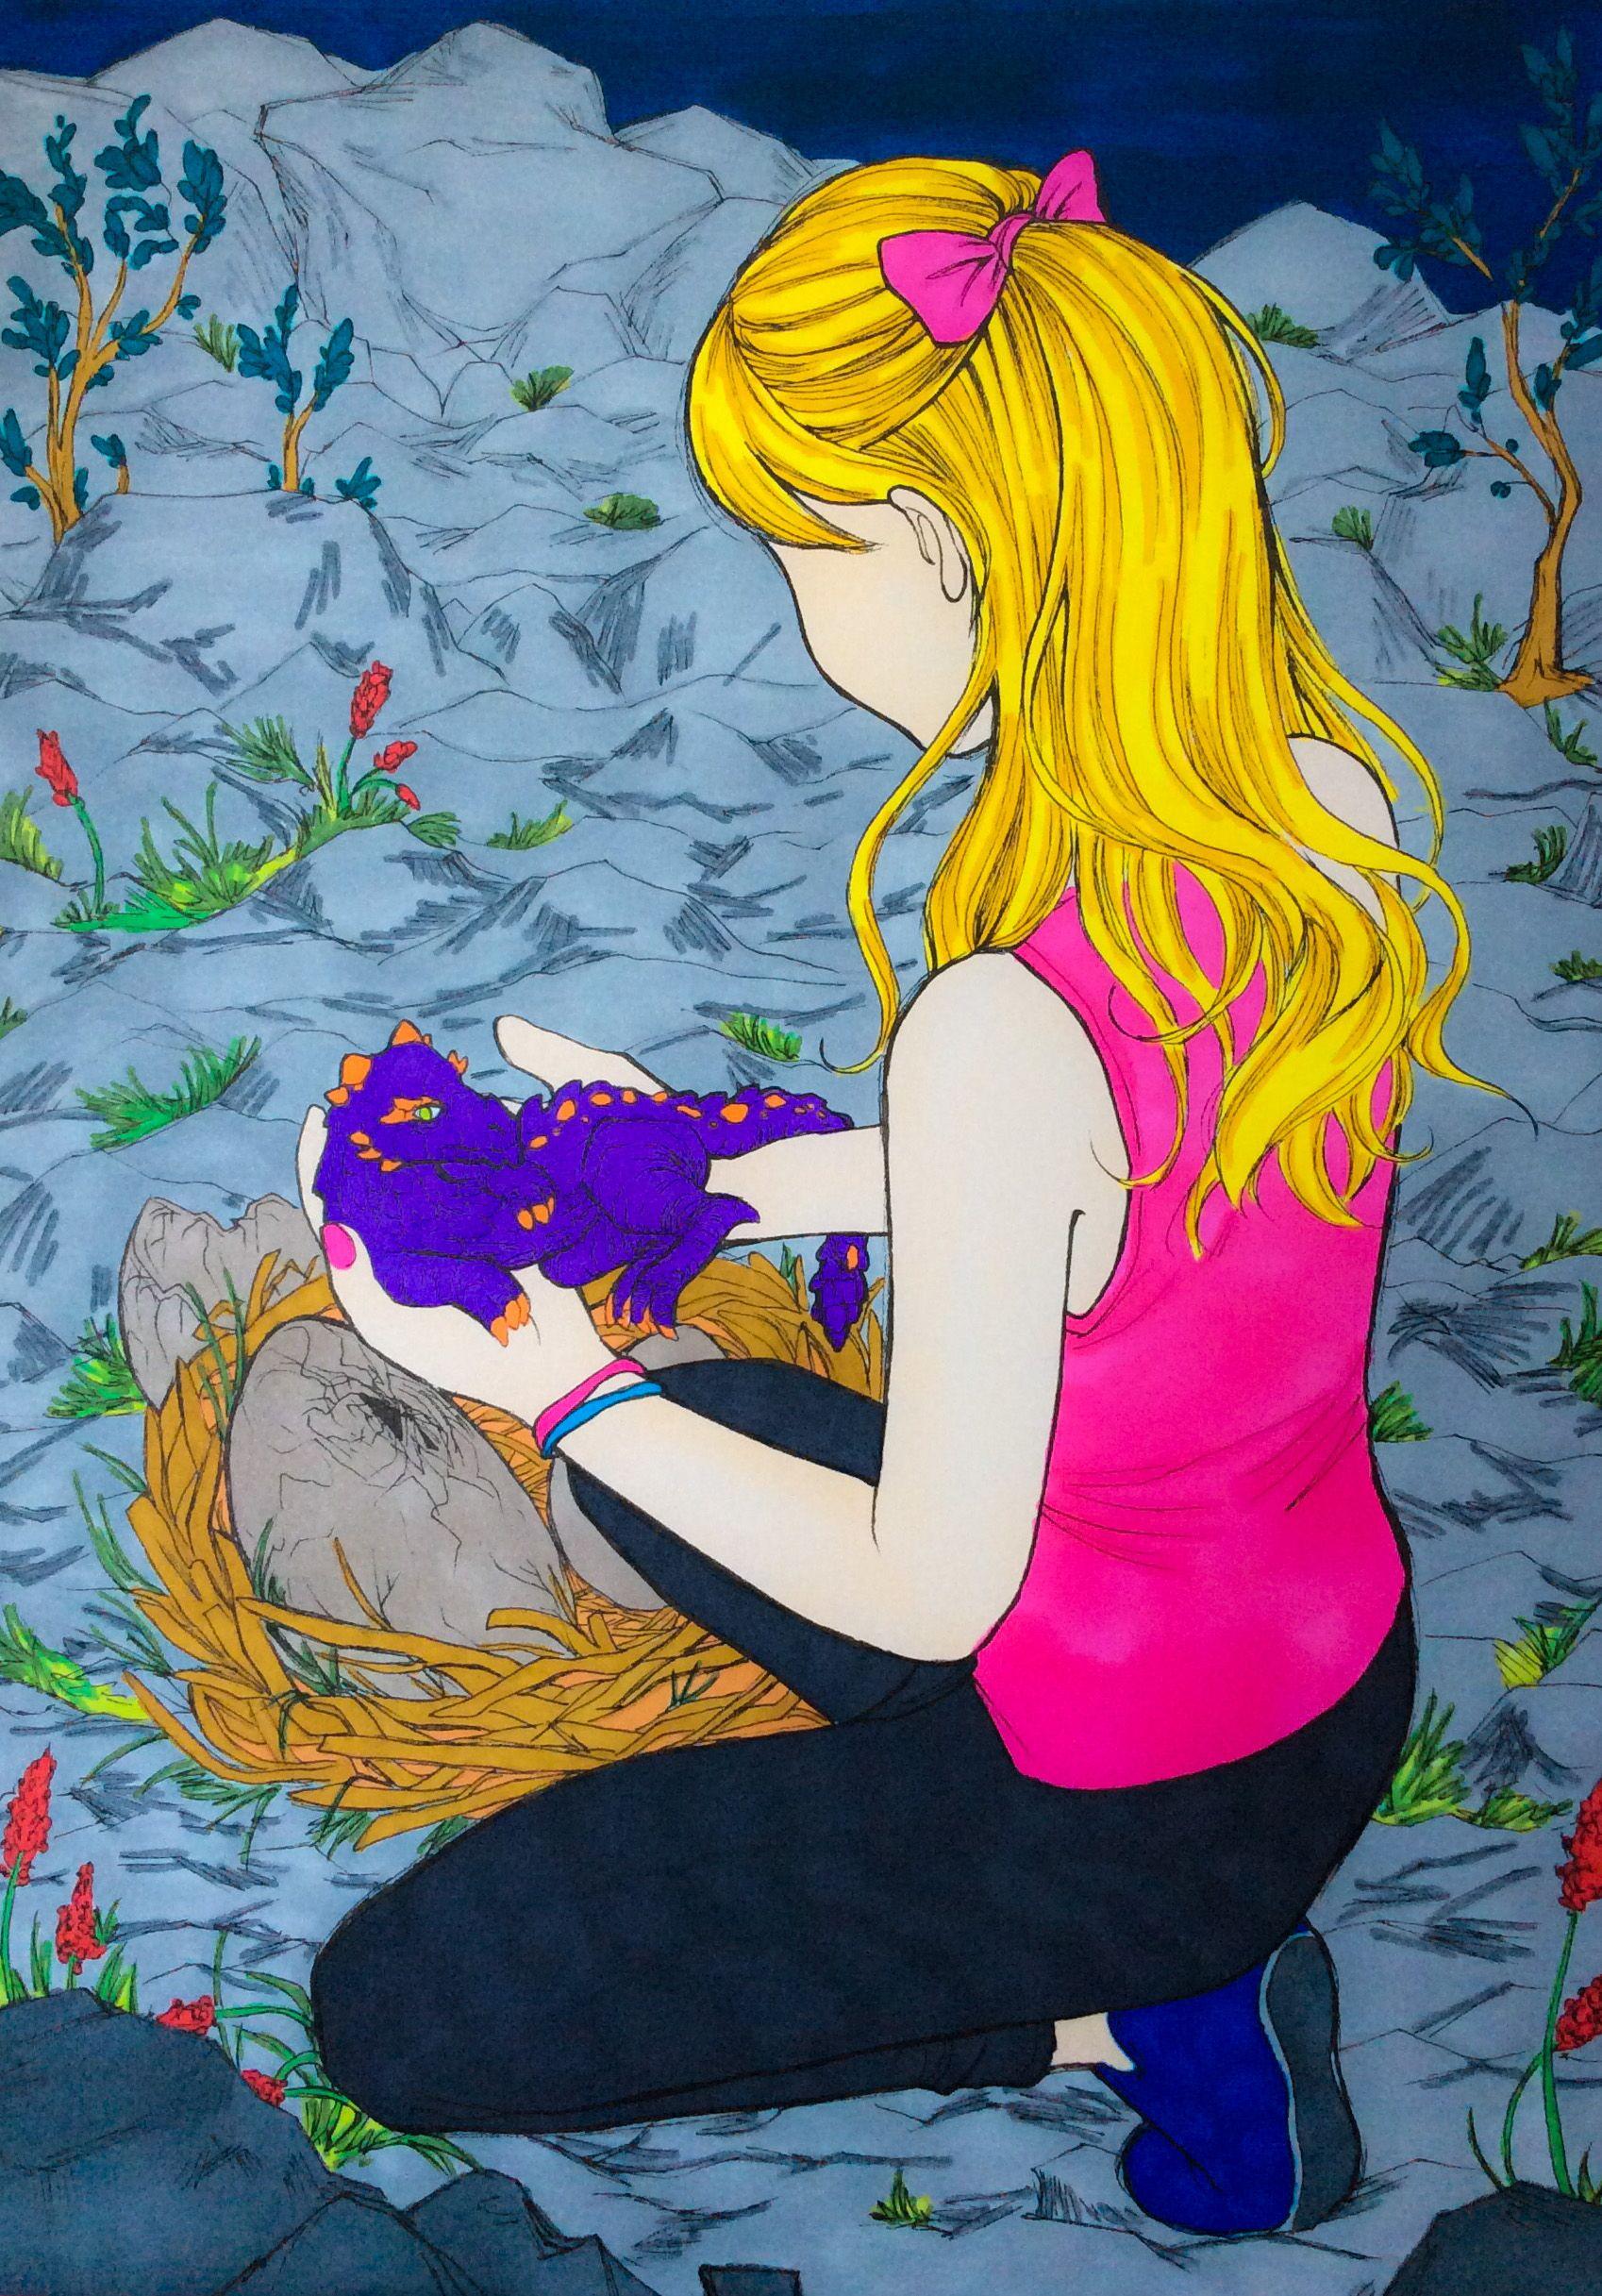 Pin By Malinoweloki On Olsikowa Portal Do Innego Swiata Disney Characters Disney Princess Character